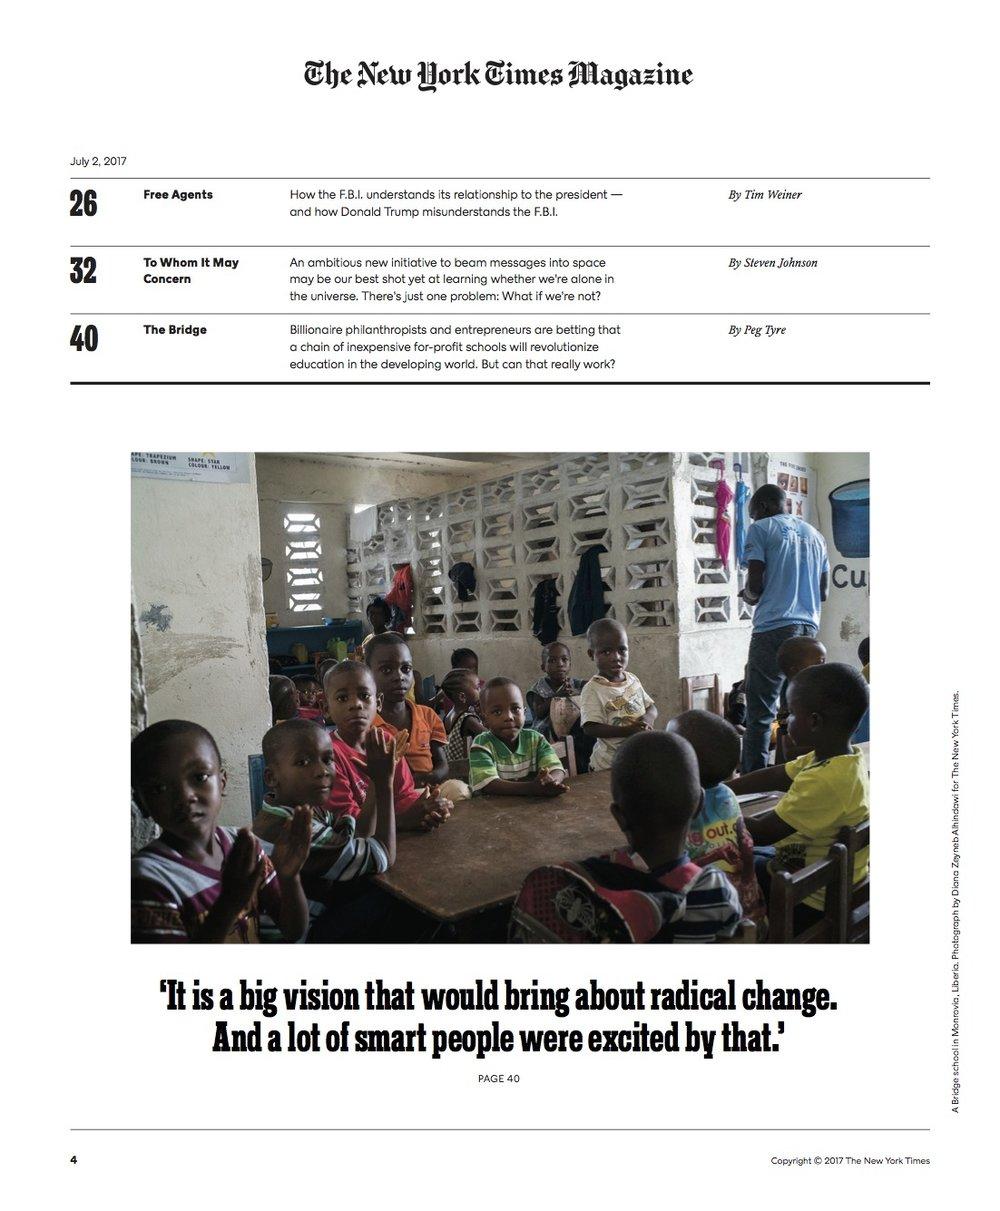 Diana Zeyneb Alhindawi_2017_07_02_New York Times Magazine_page 4_bridge education africa s.jpg